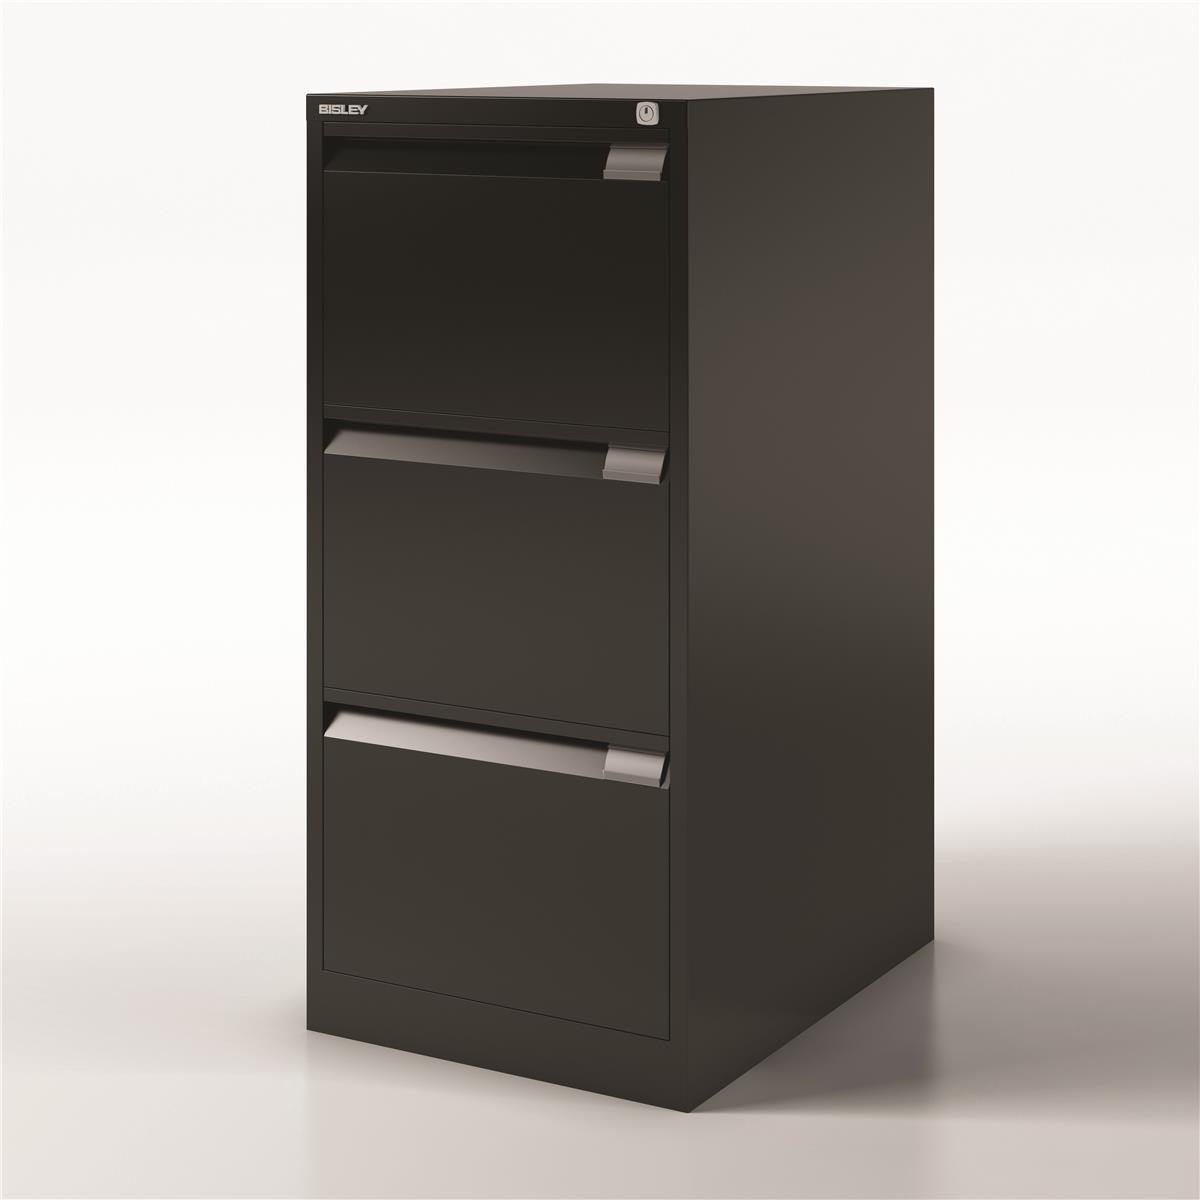 Bisley Filing Cabinet 470x622x1016mm 3 Drawer Black Ref 1633-av1